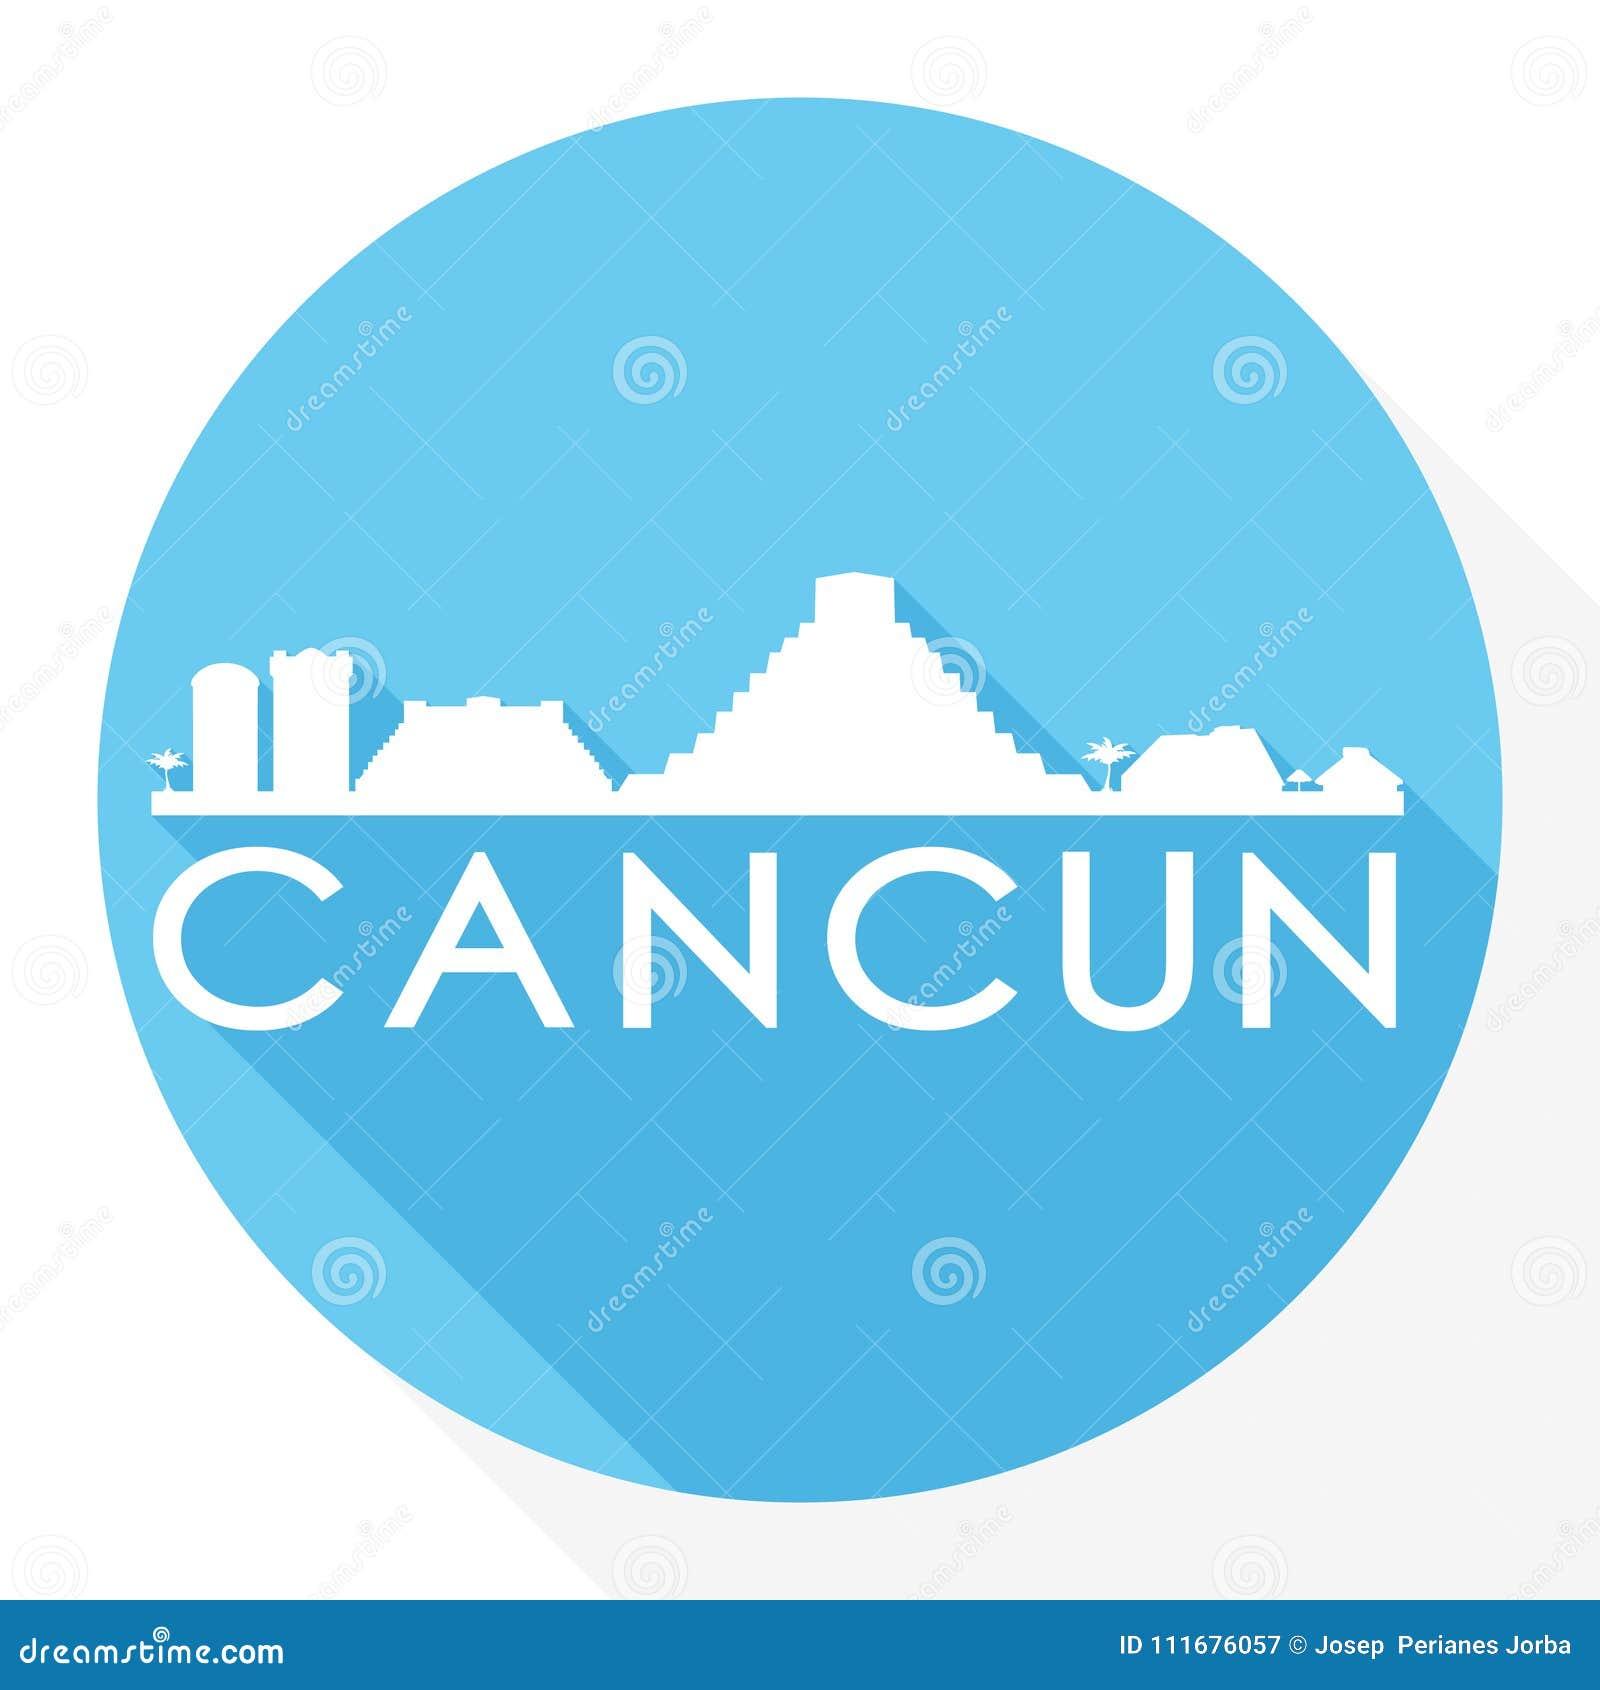 Cancun Mexico Round Icon Vector Art Flat Shadow Design Skyline City